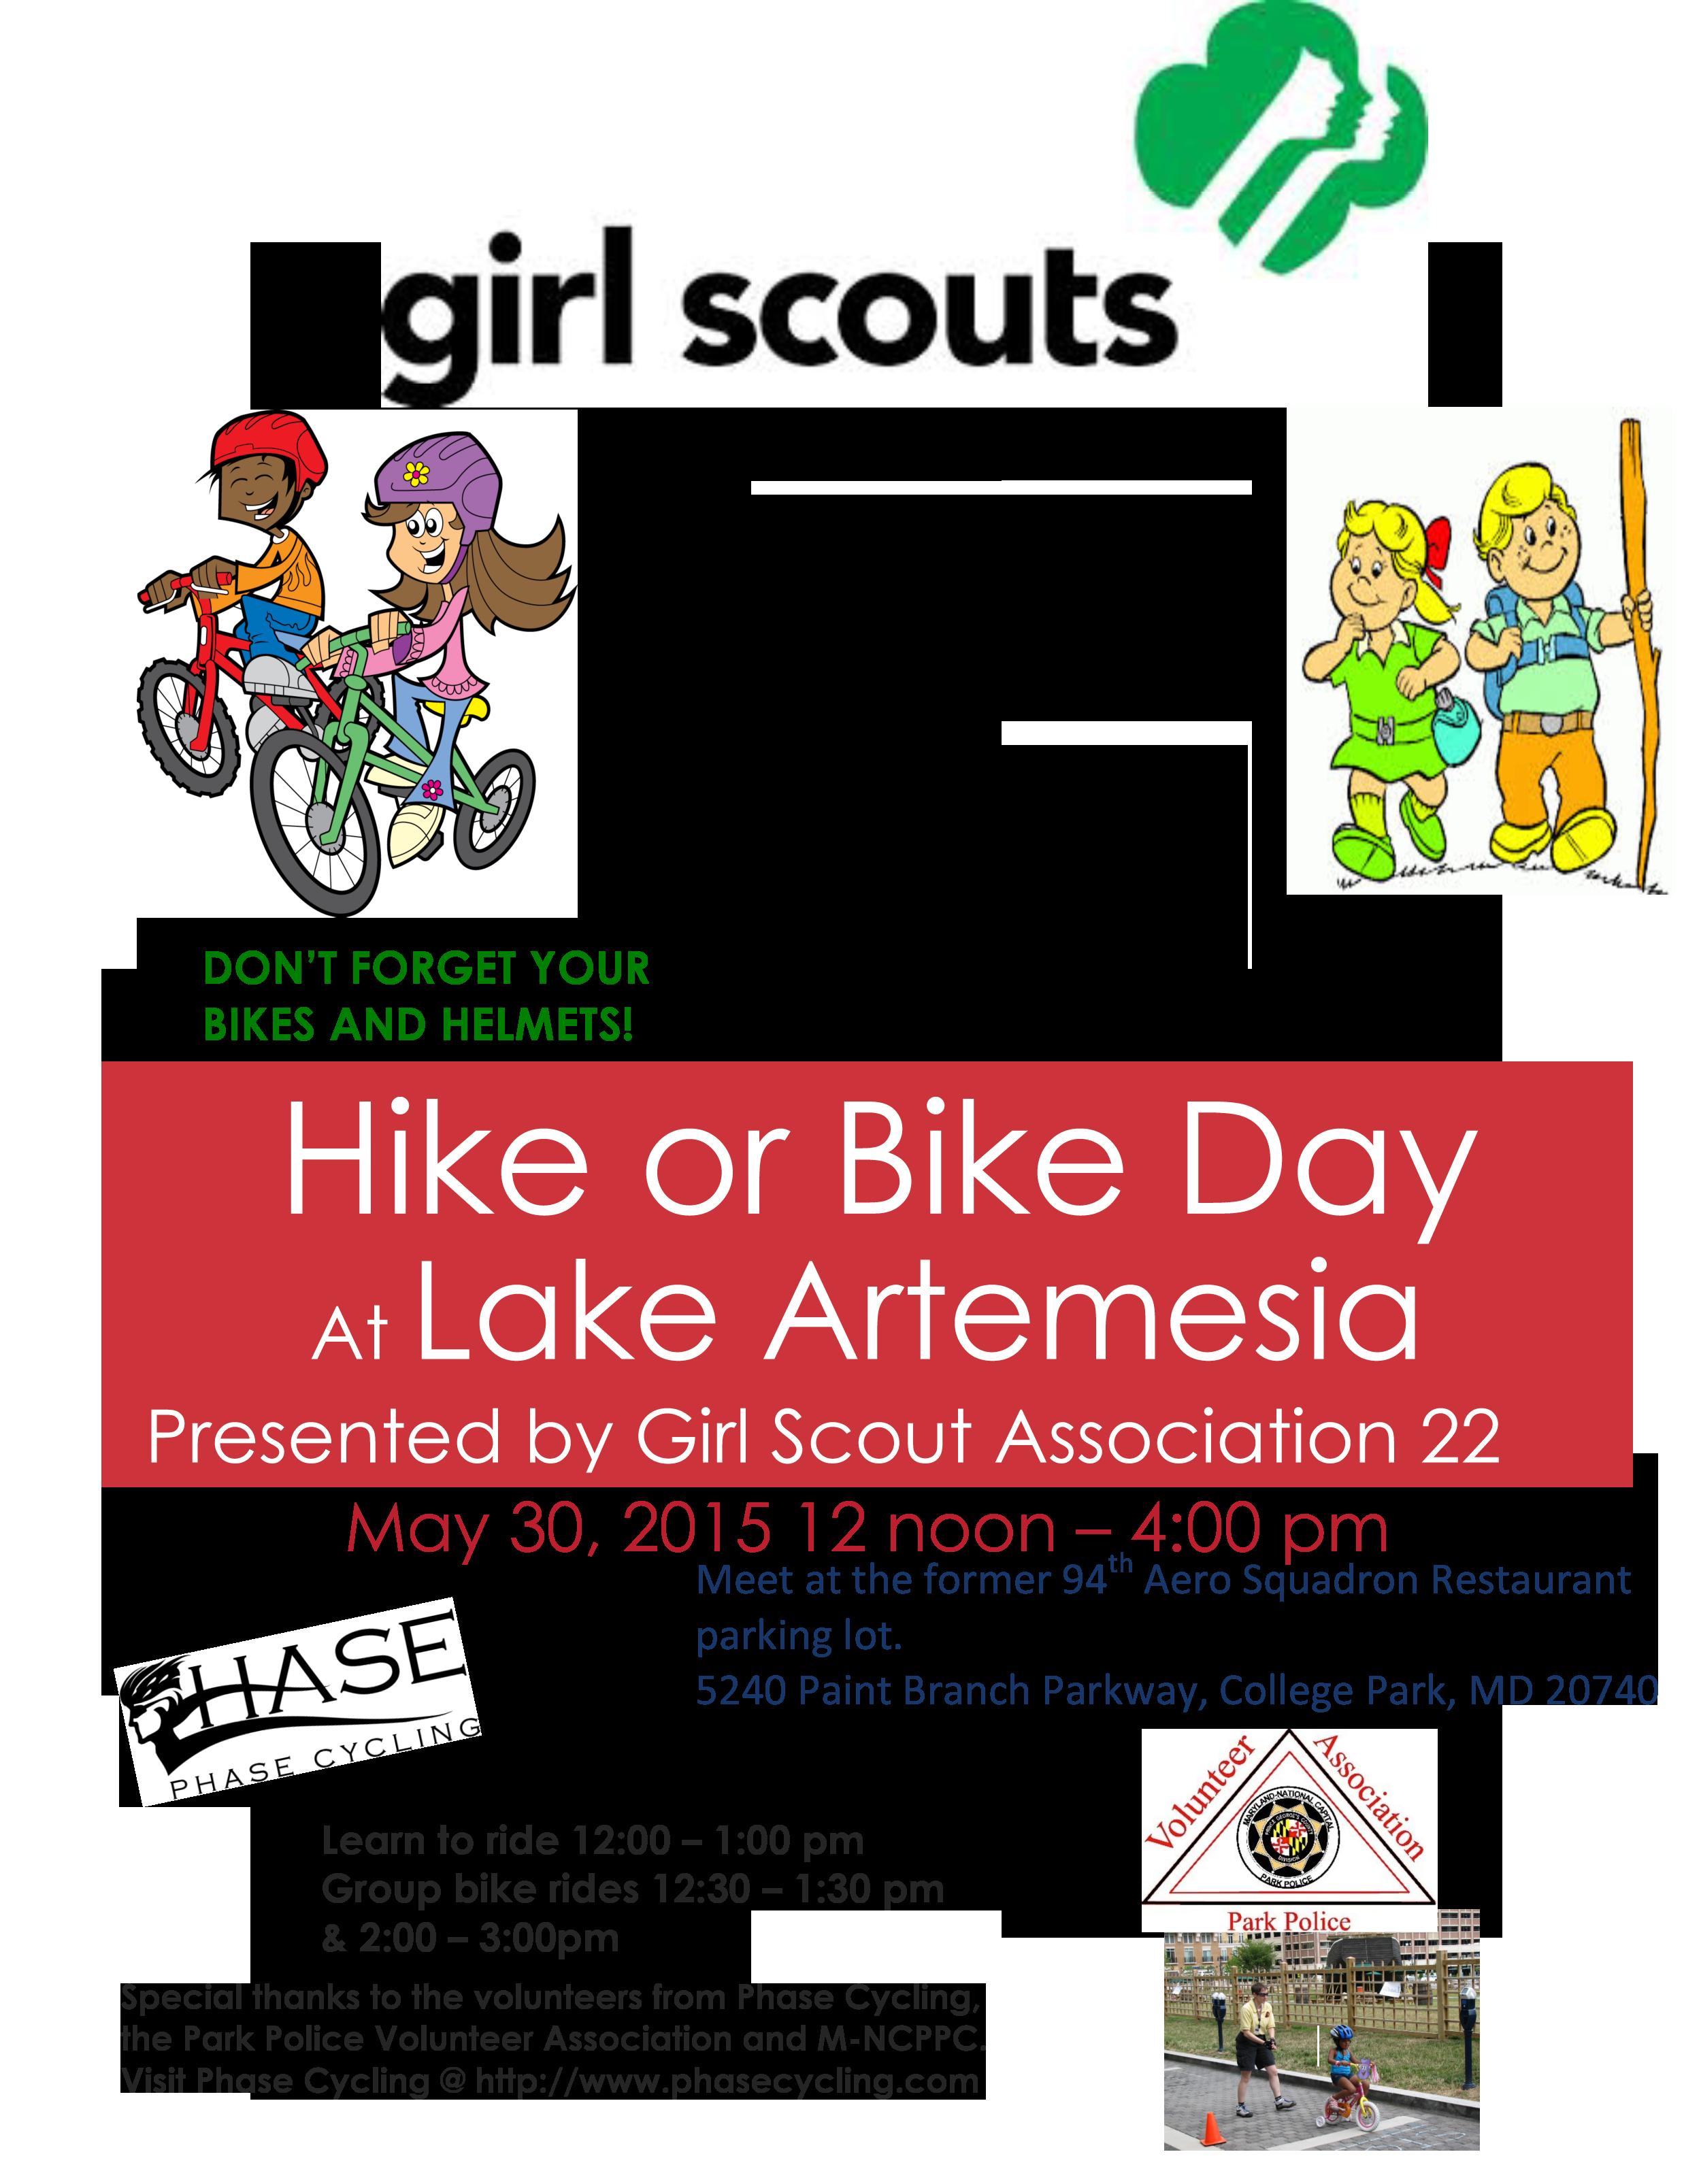 Girl Scouts Registration Form 2016